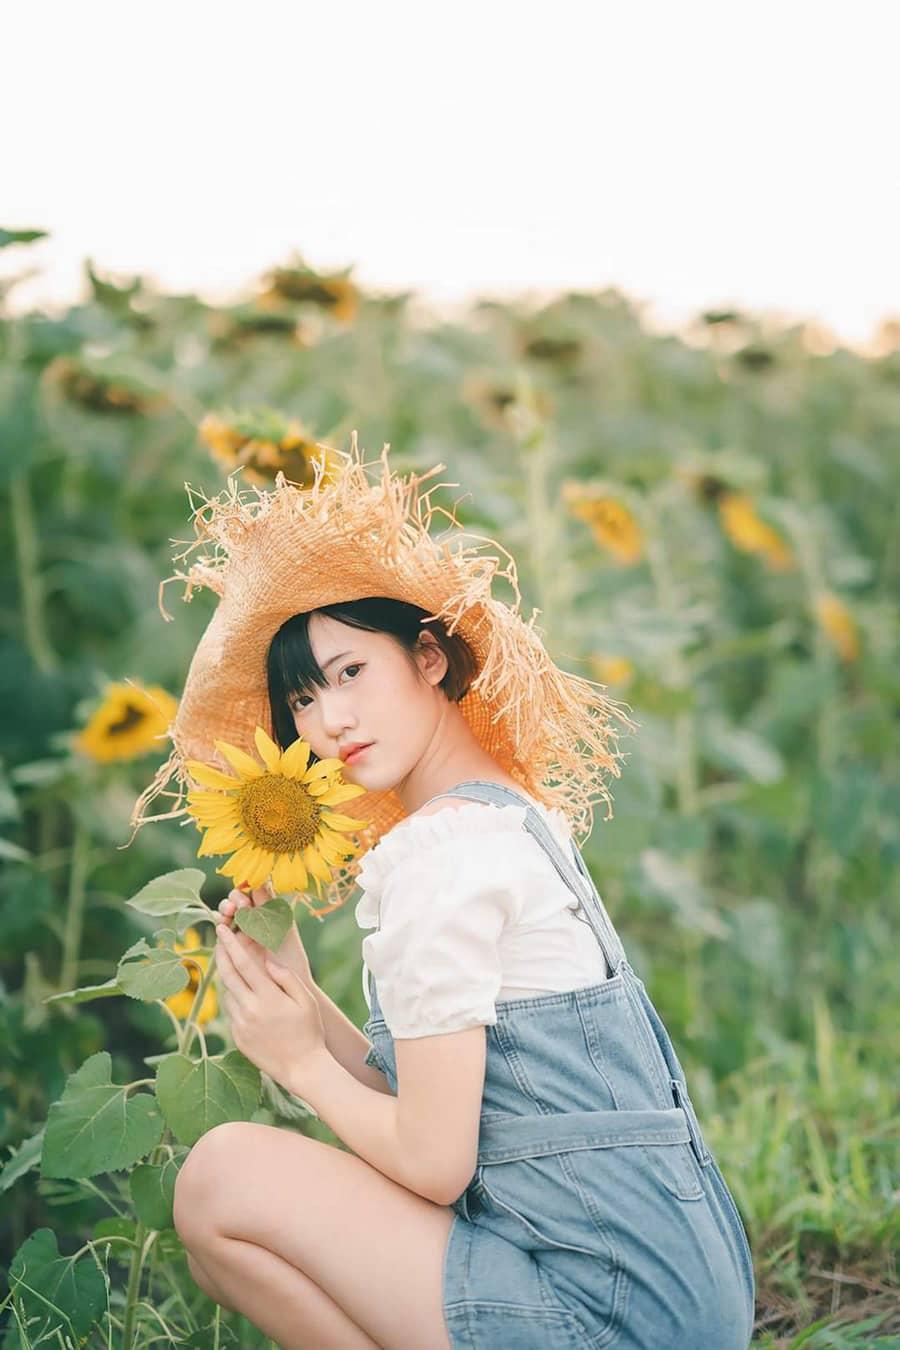 MoiiChan - 田园女孩 [26P170M]